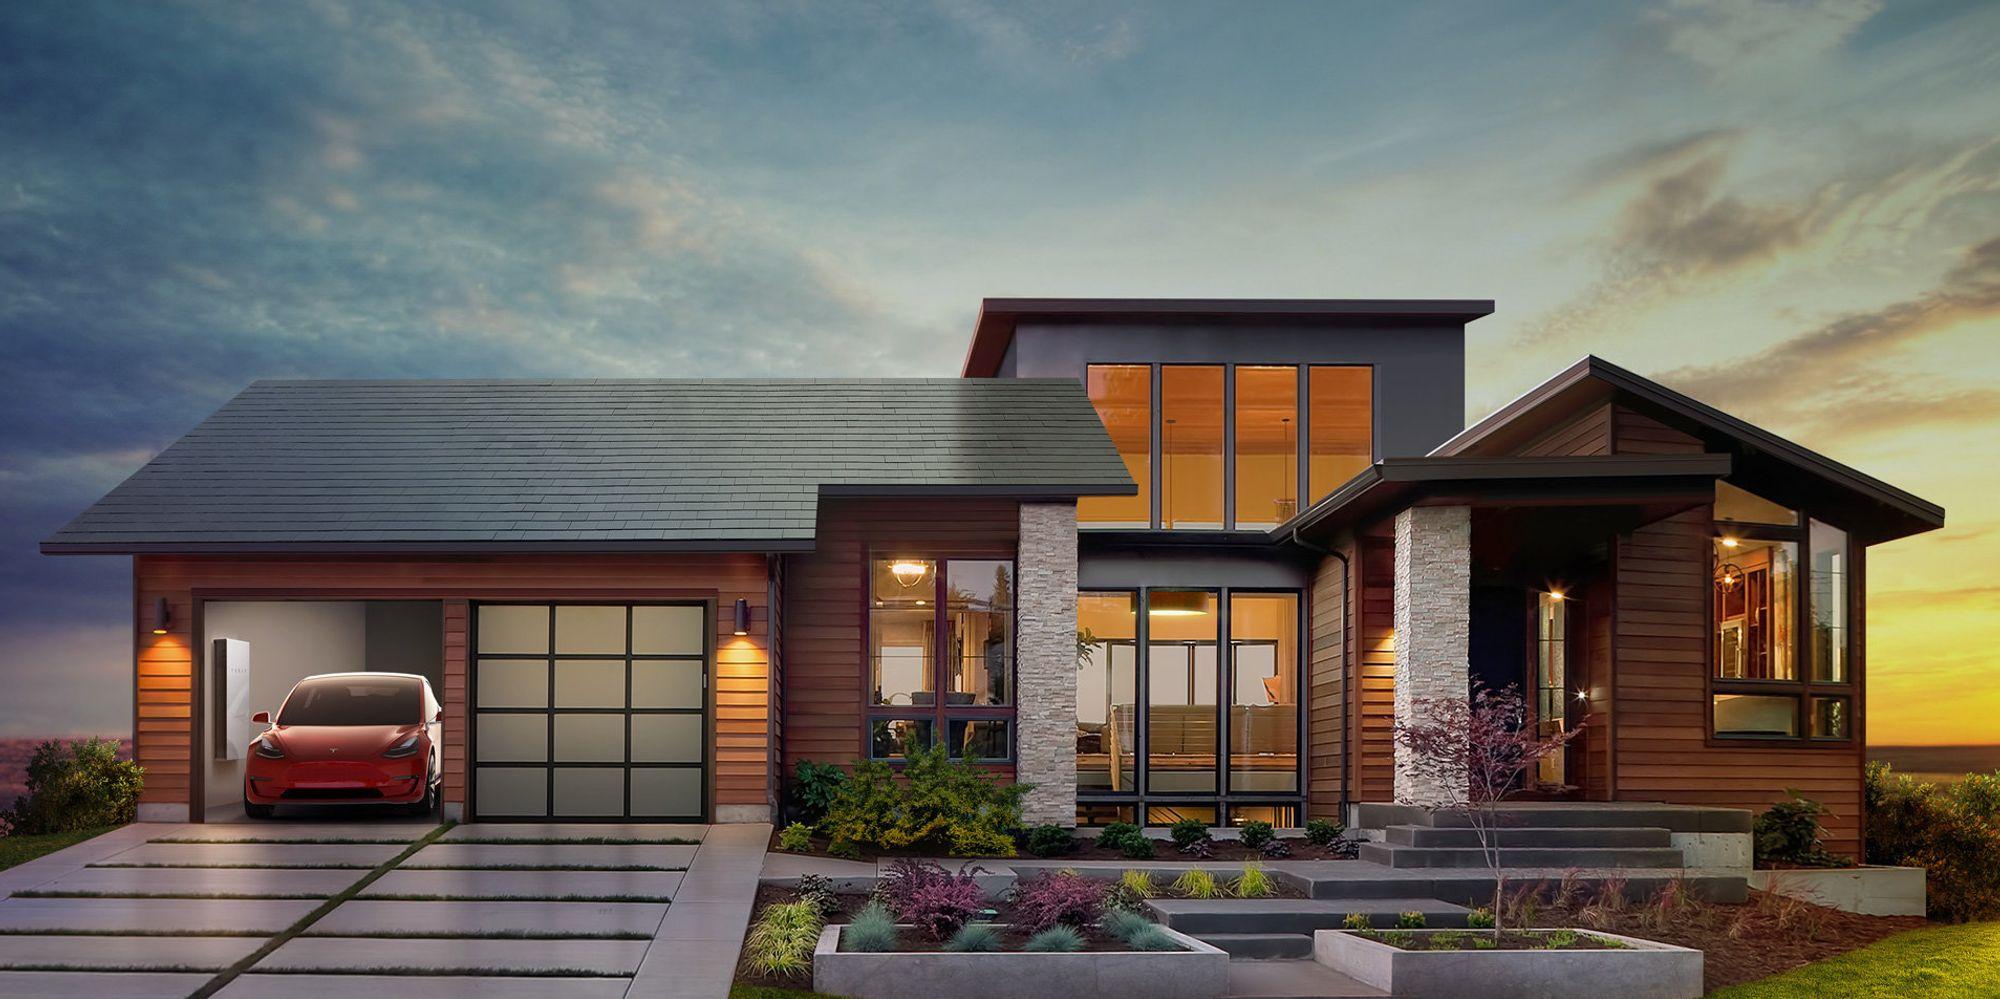 http://www.huffingtonpost.com/entry/tesla-solar-roof_us_5814025ae4b0390e69d07c6e